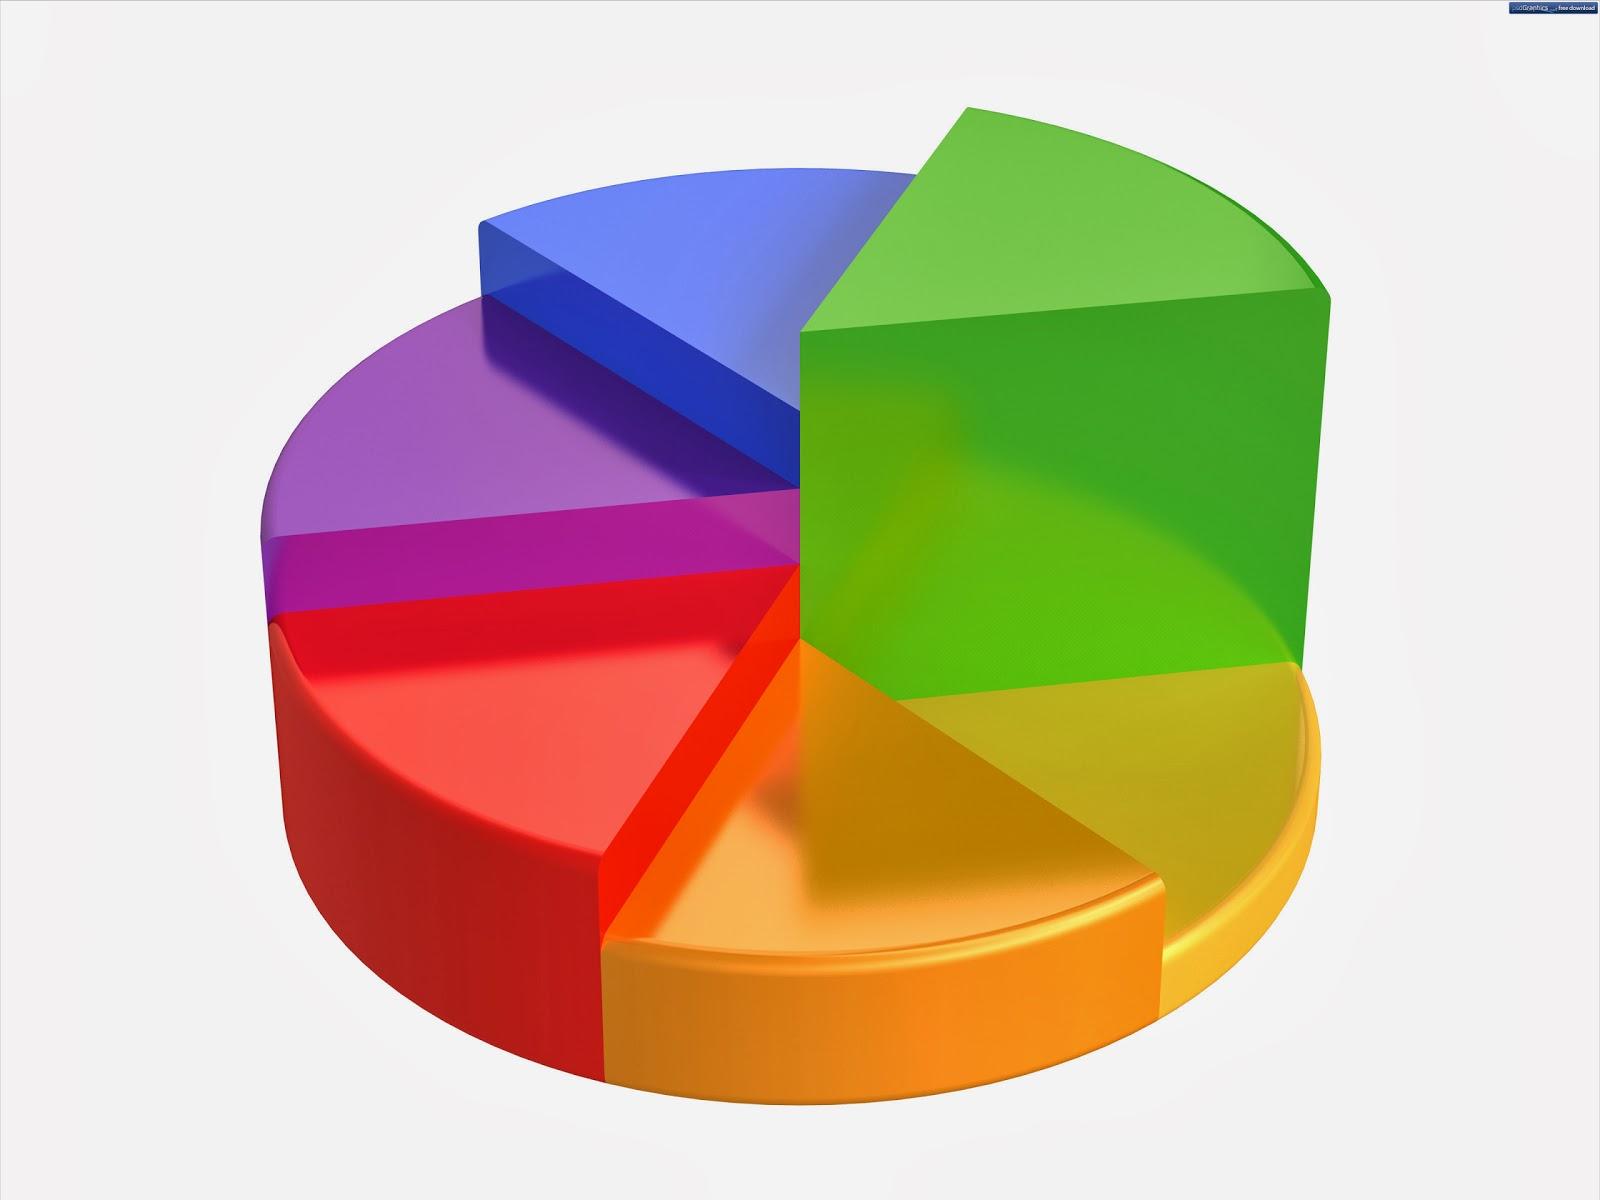 contoh Pie Chart Manajemen Proyek, Bar chart Manajemen konstruksi